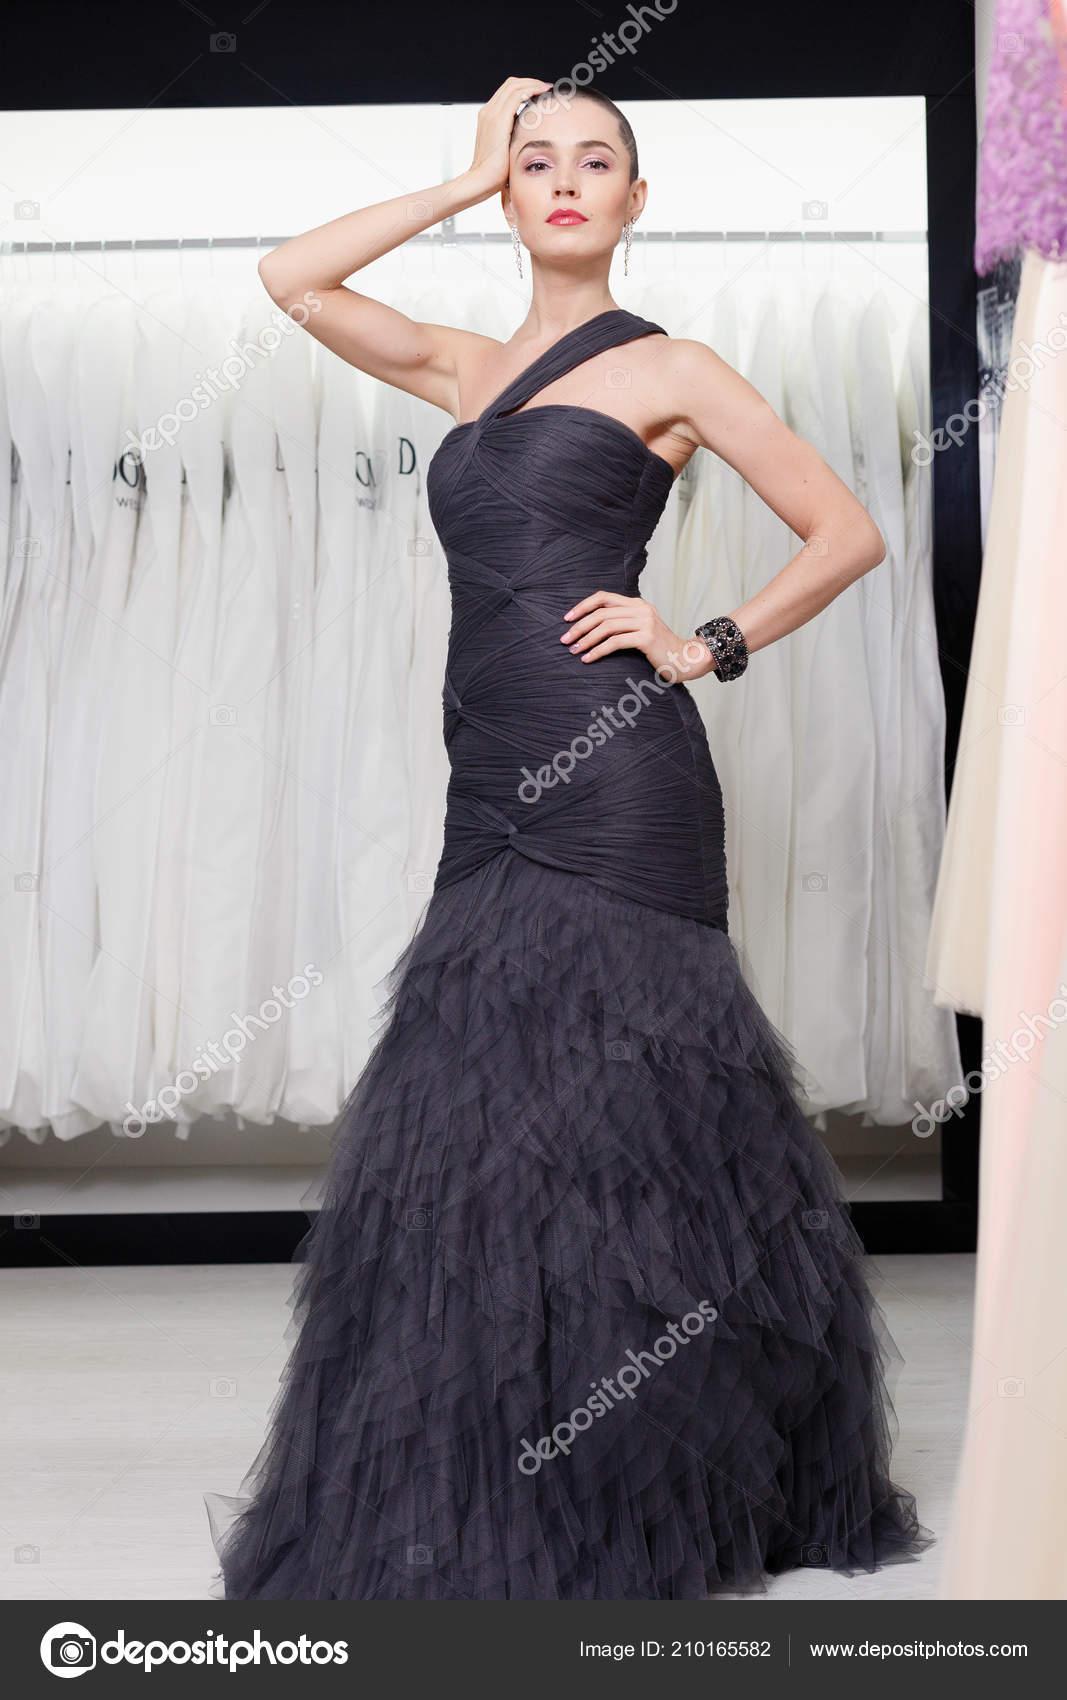 5fbeaaf603 Exotic Woman Short Hair Beauty Style Portrait Fashion Girl Posing ...